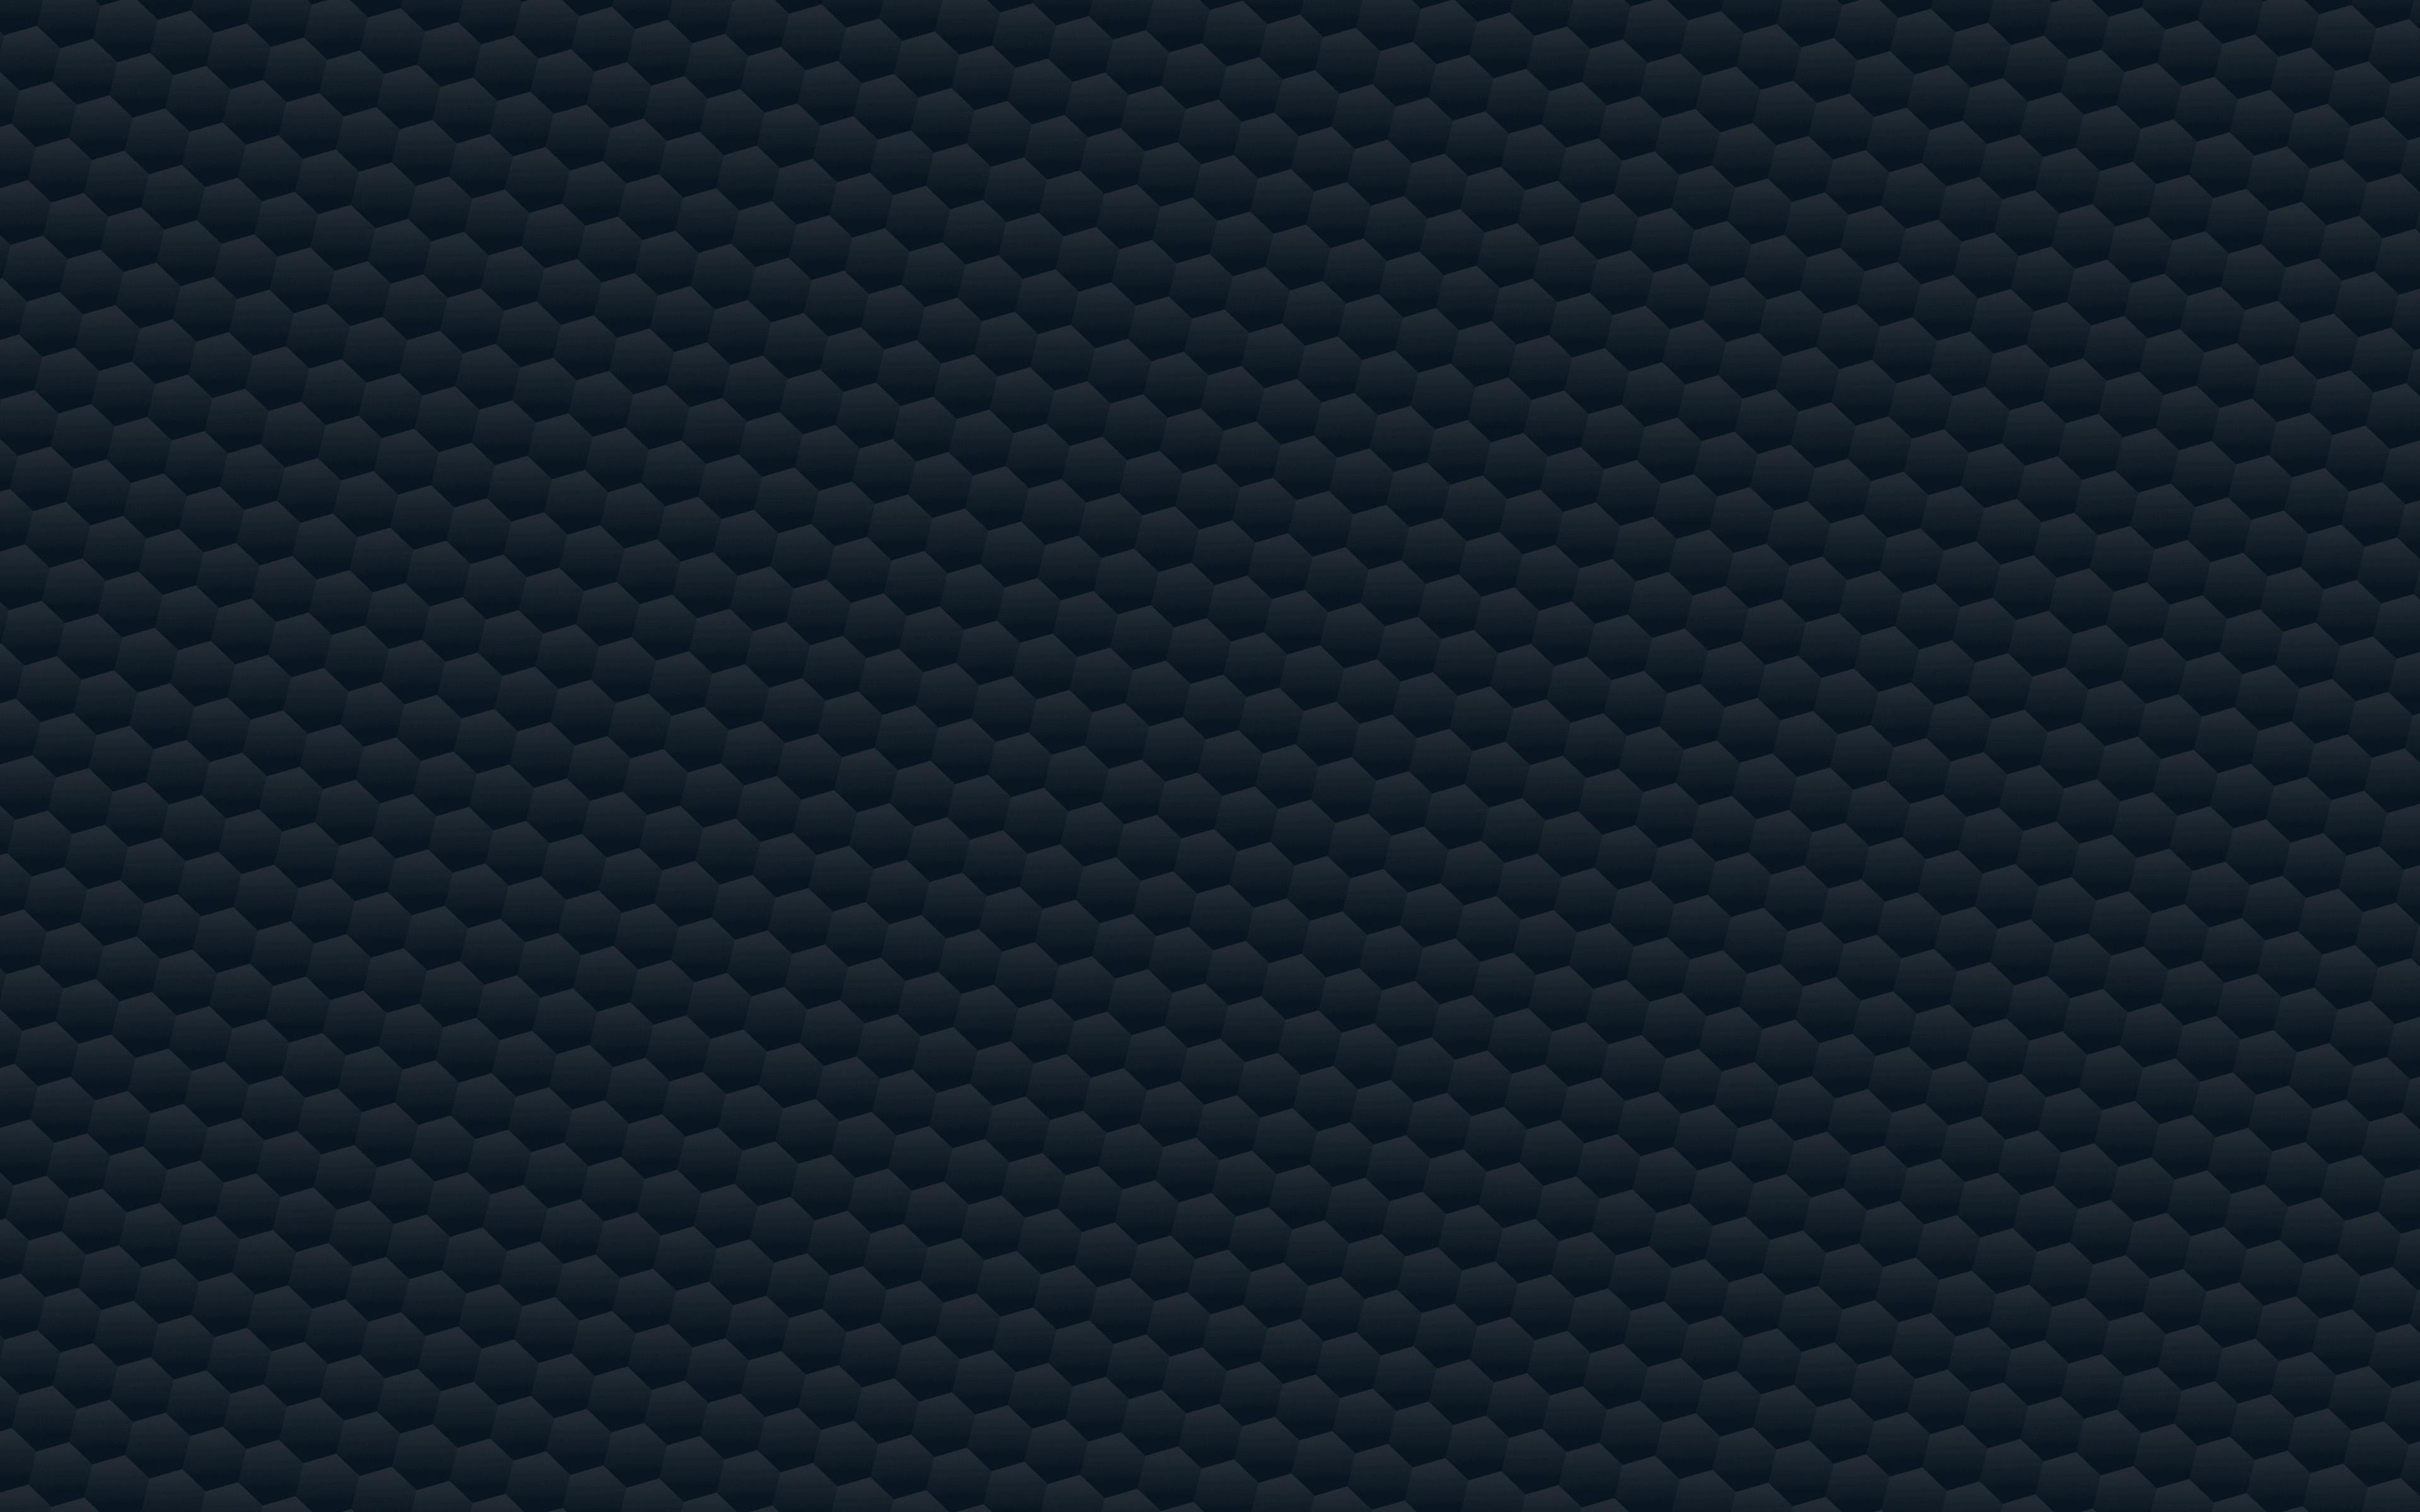 vj36-honeycomb-dark-blue-poly-pattern-wallpaper